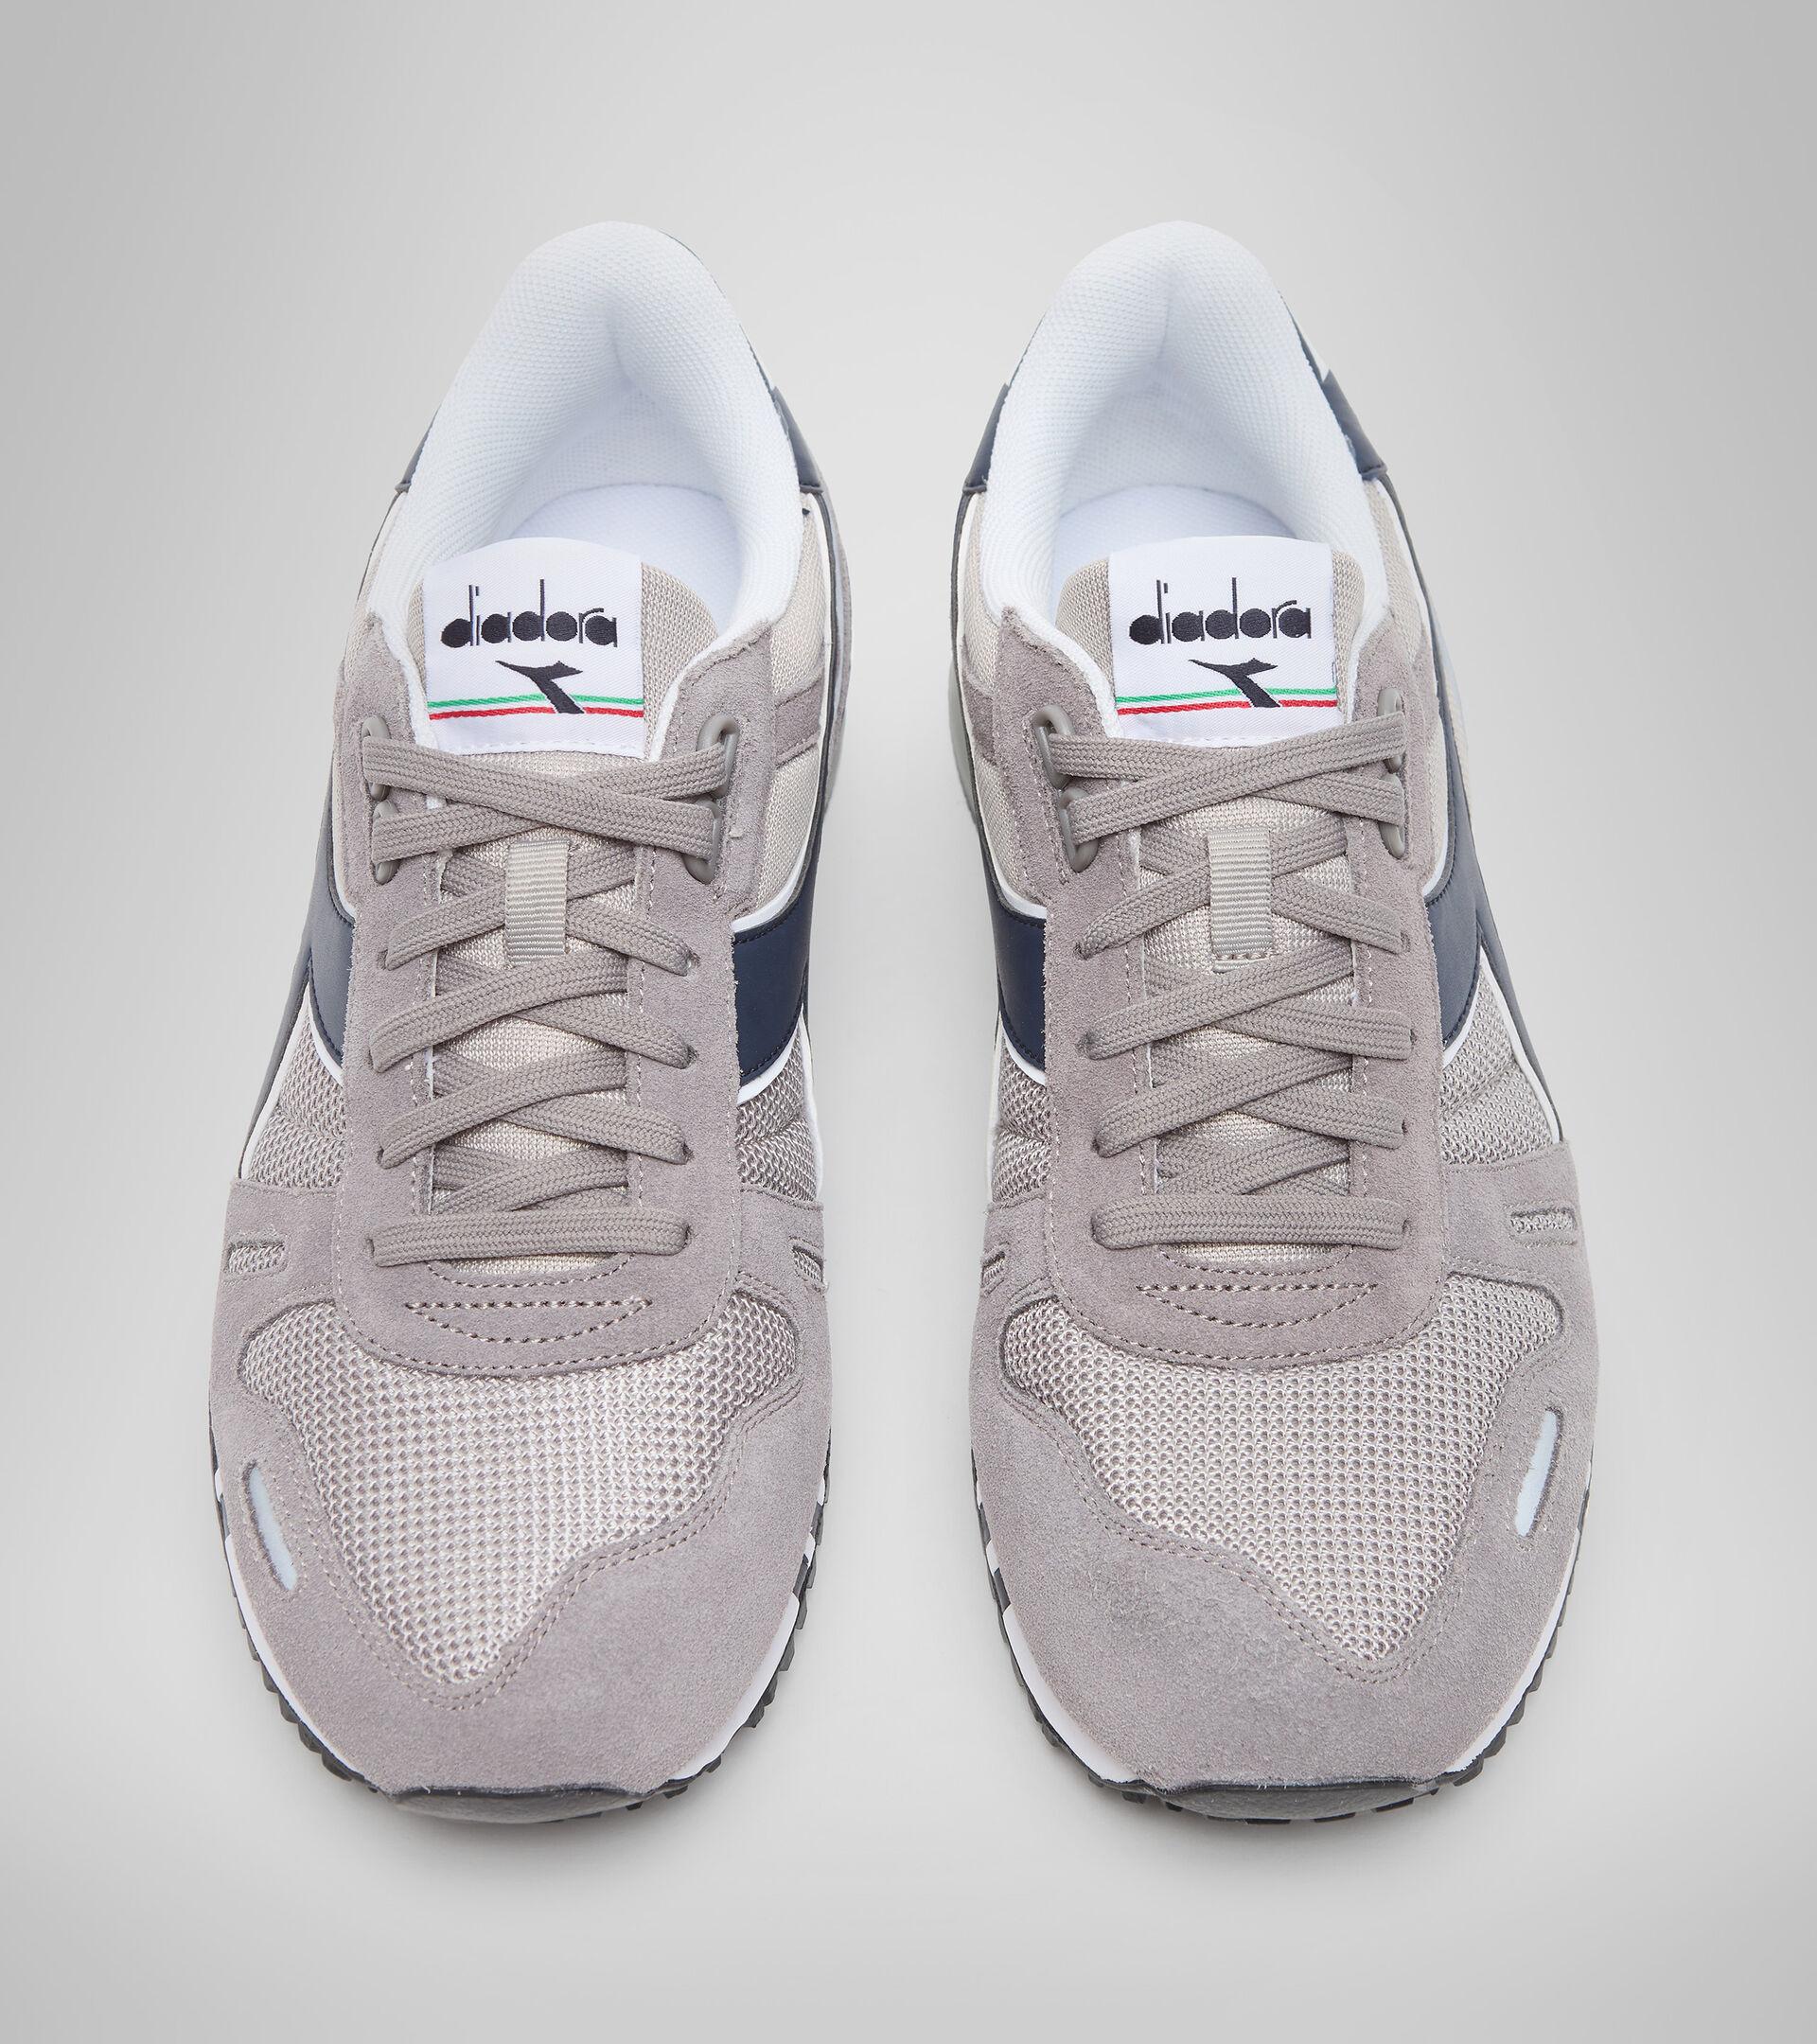 Footwear Sportswear UOMO TITAN GRIGIO PALOMA/BLU PROFONDO Diadora